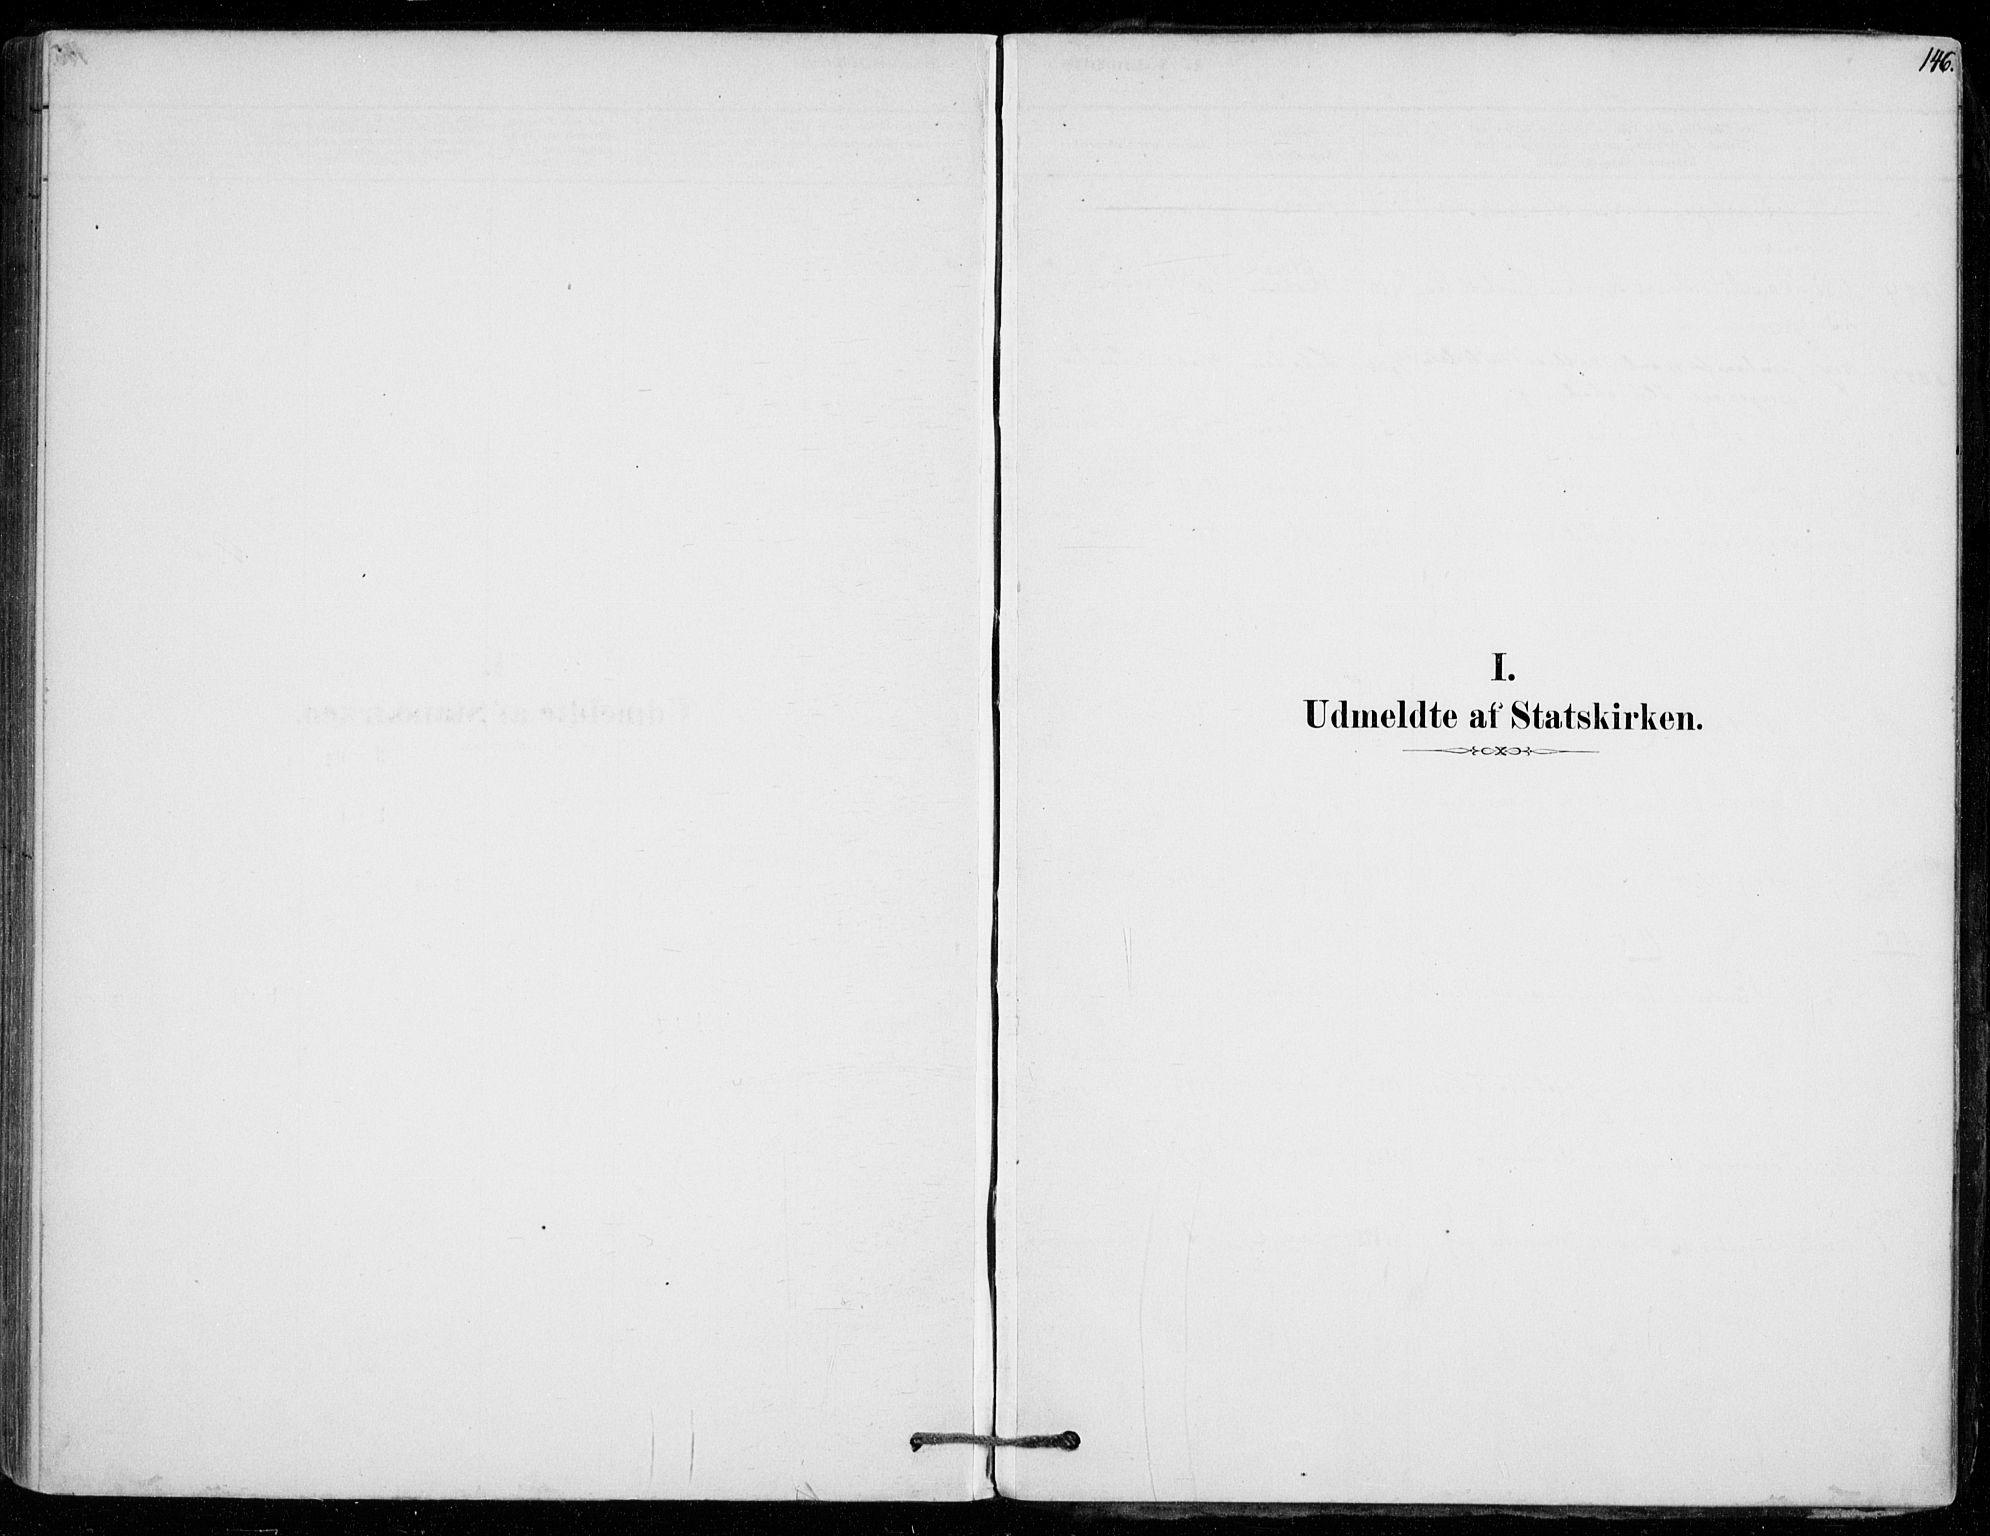 SAO, Vestby prestekontor Kirkebøker, F/Fe/L0001: Parish register (official) no. V 1, 1878-1931, p. 146